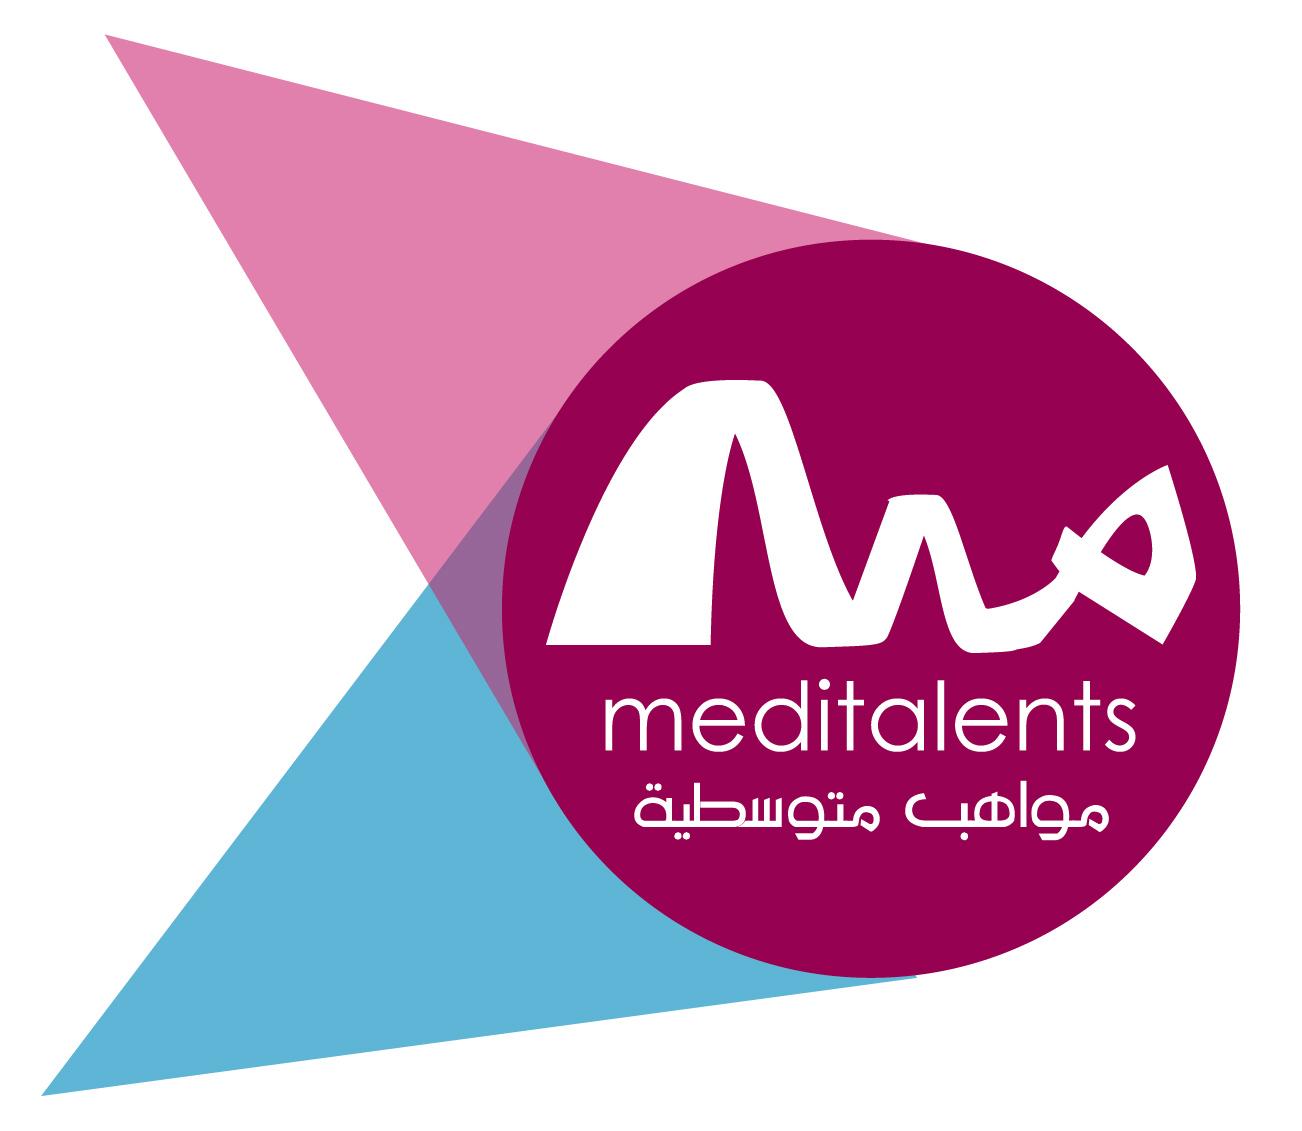 Logo meditalents